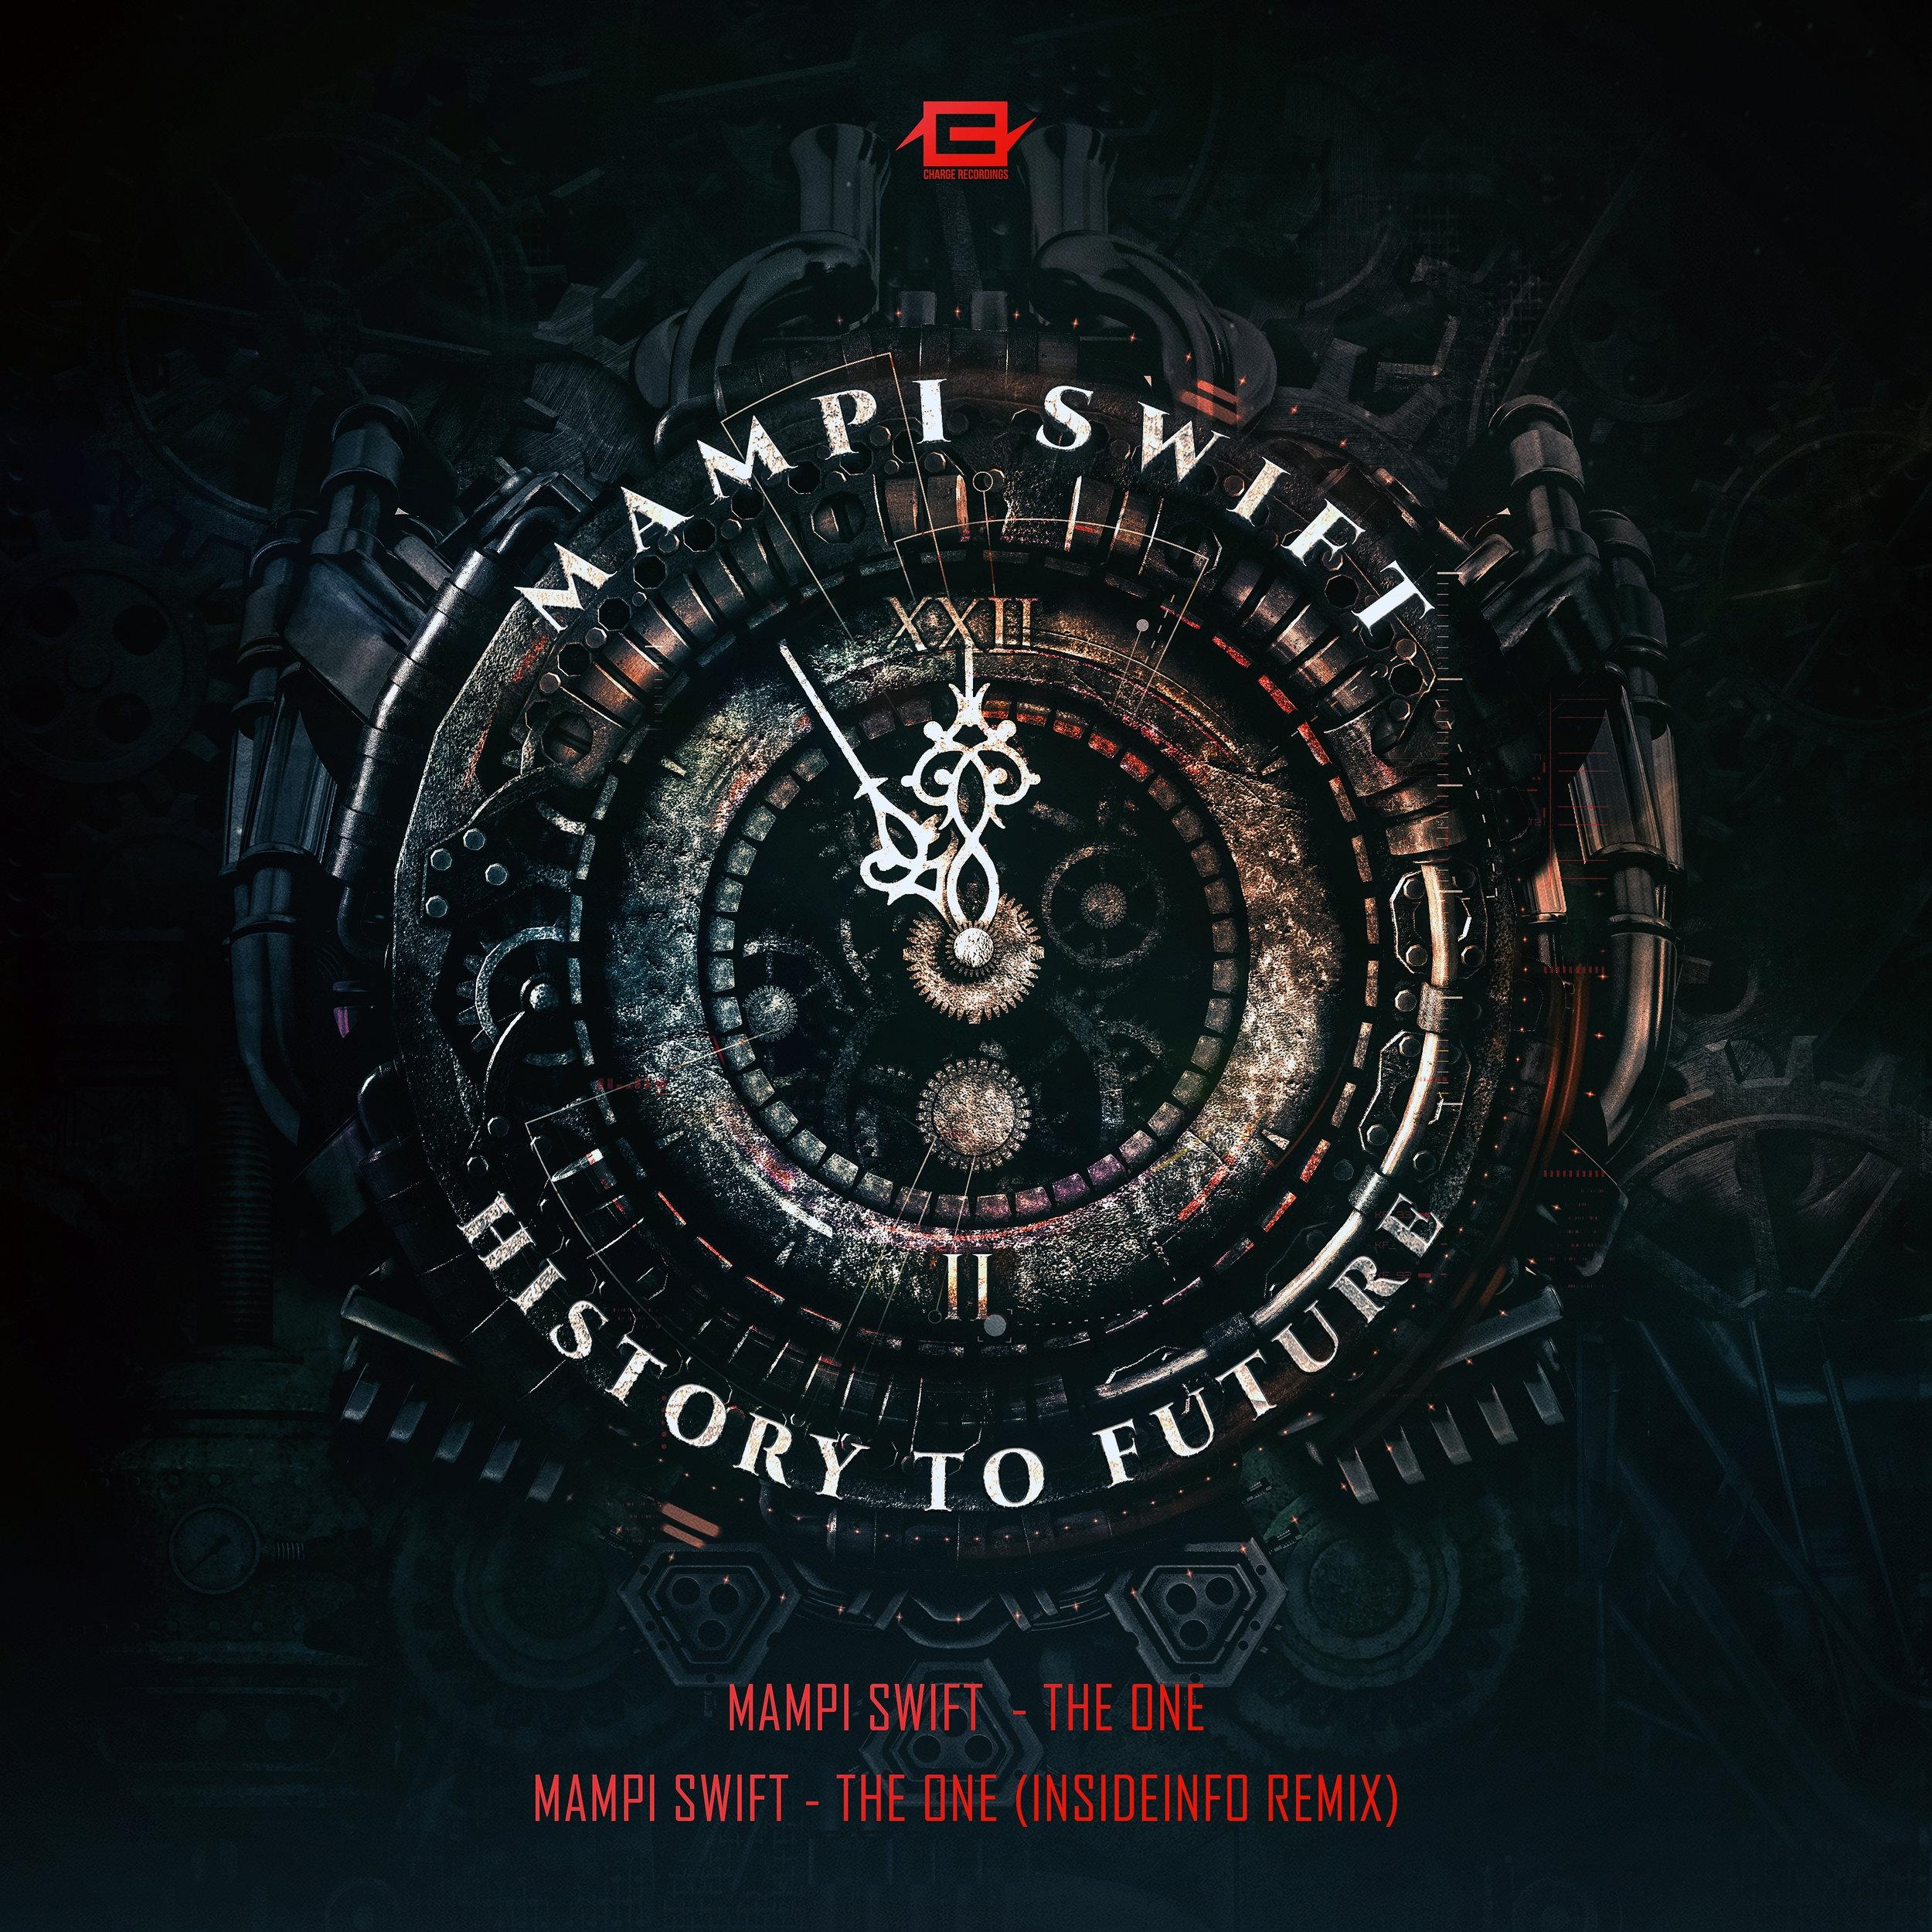 Mampi Swift - The One (InsideInfo Remix)